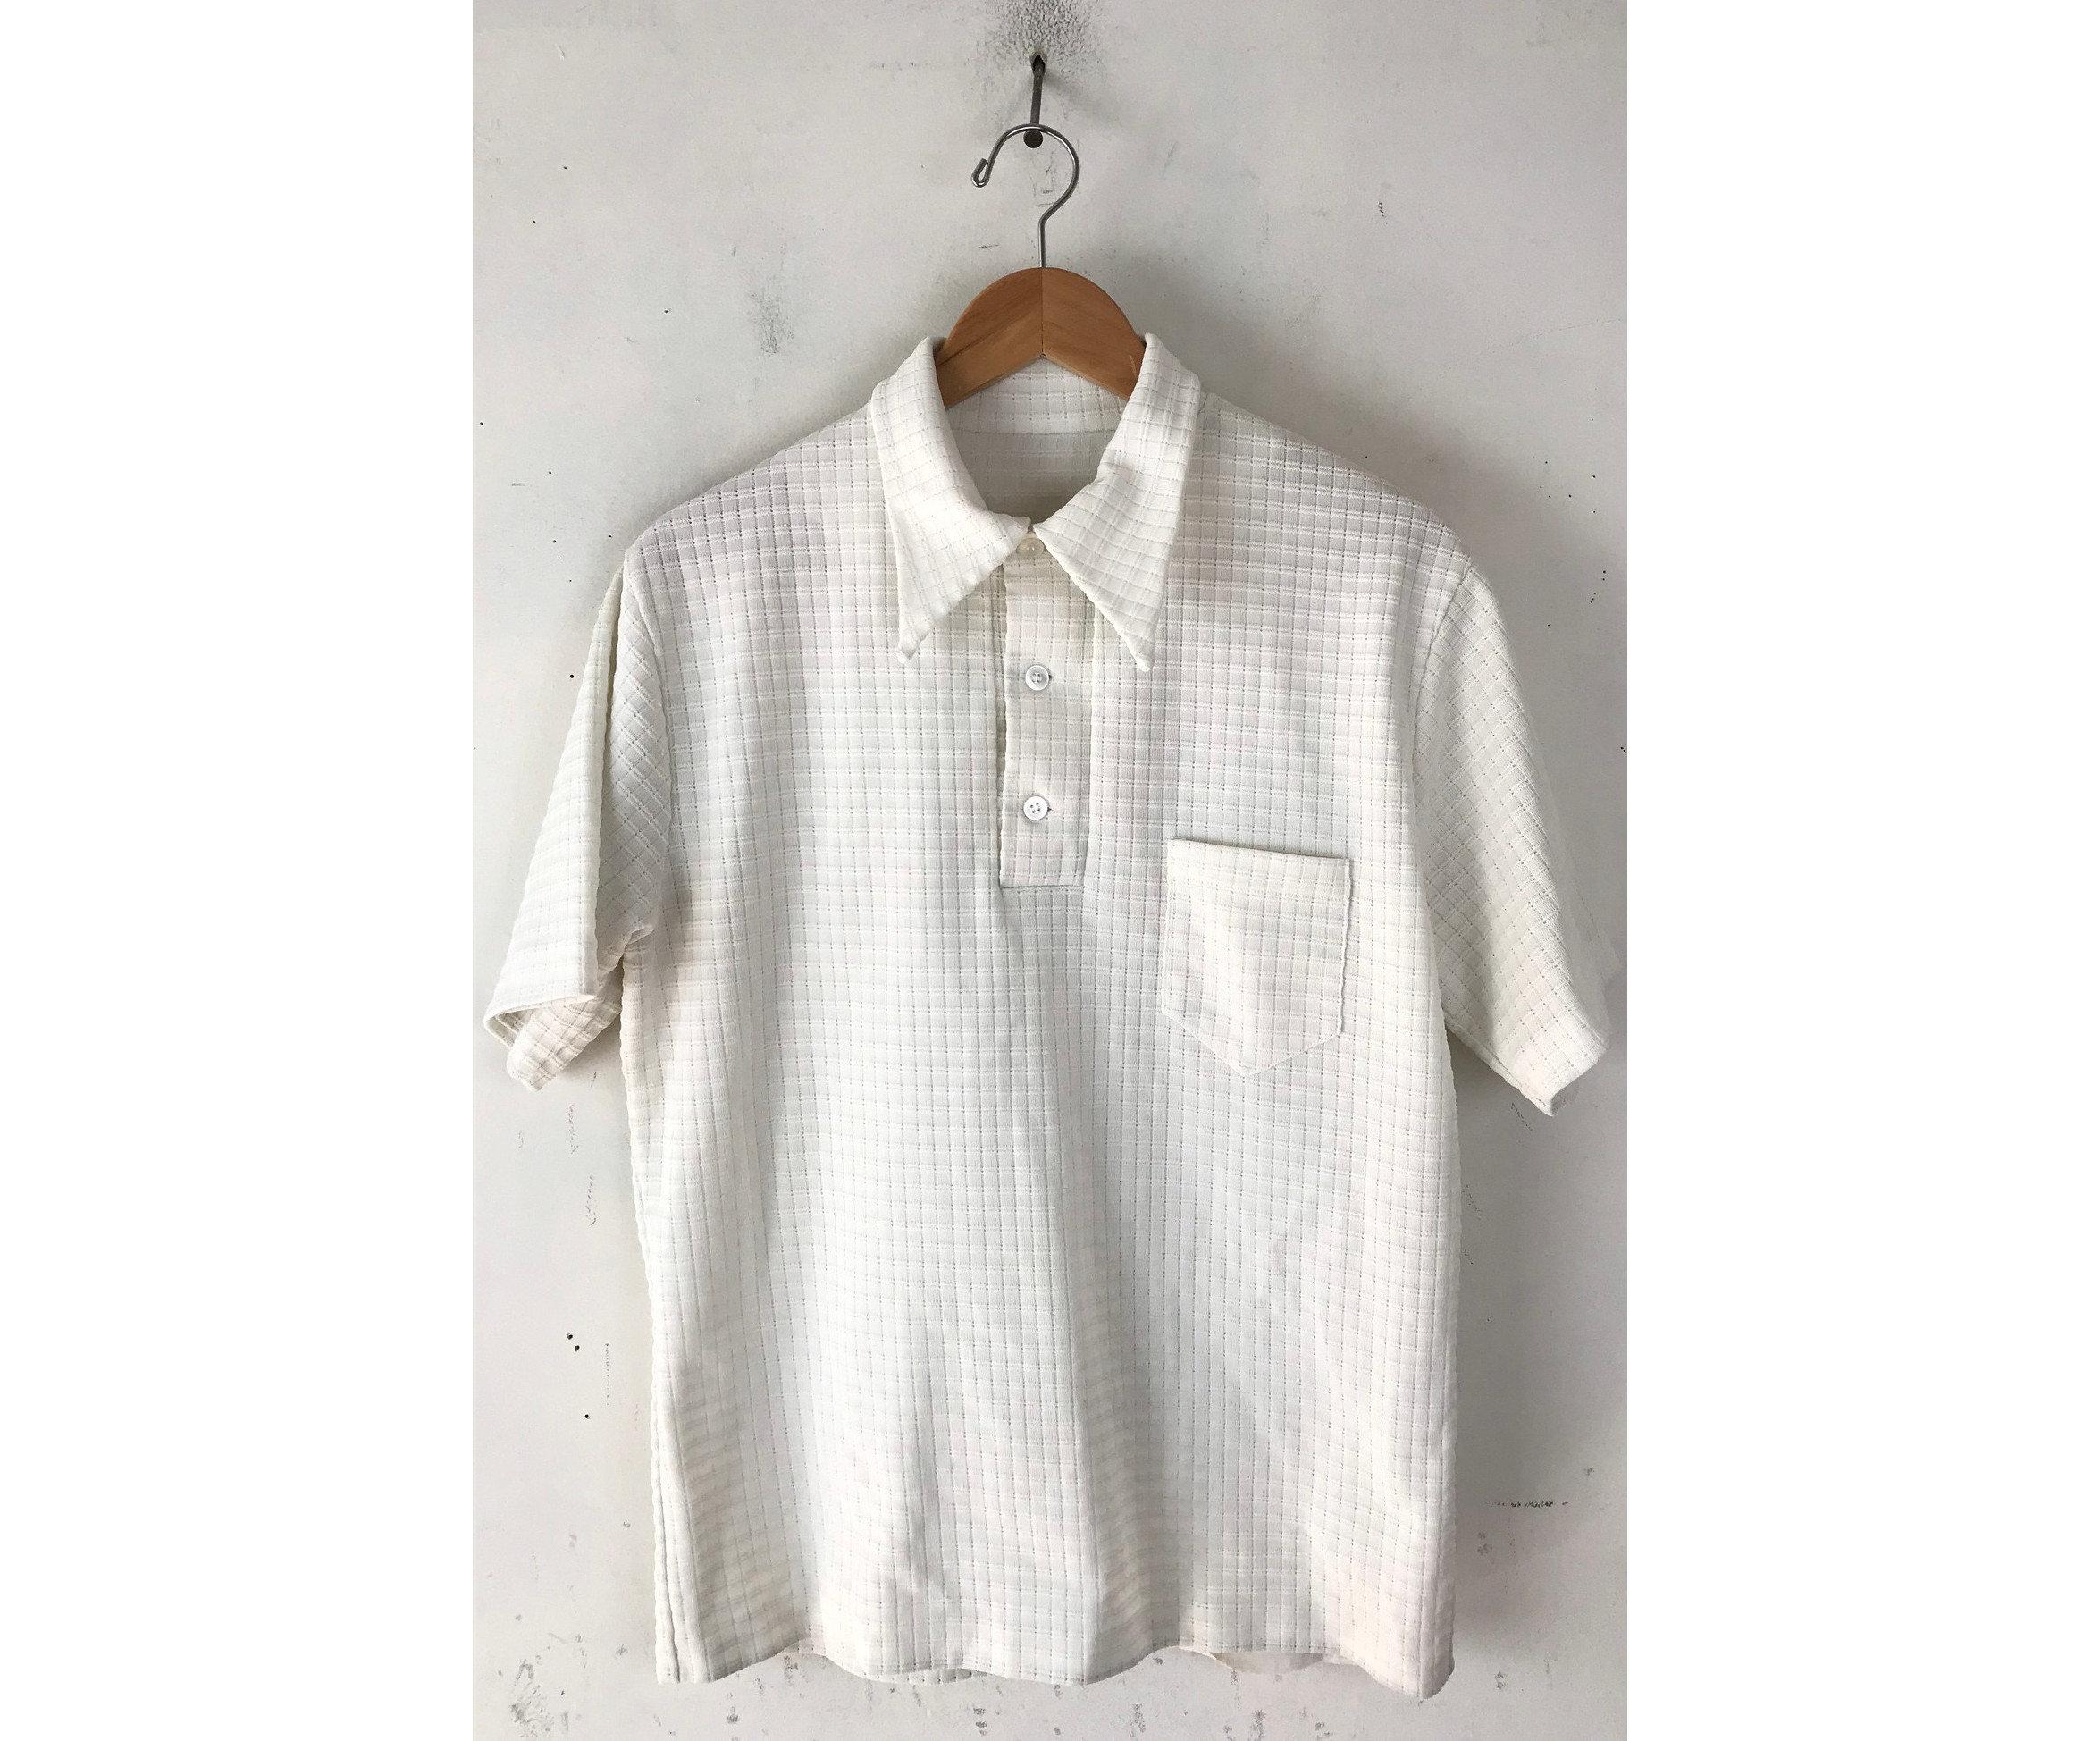 1970s Mens Shirt Styles – Vintage 70s Shirts for Guys 70S White Plaid Handmade Polo Shirt Mens Medium, Vintage Retro Disco Shirt, Knit Preppy $26.00 AT vintagedancer.com